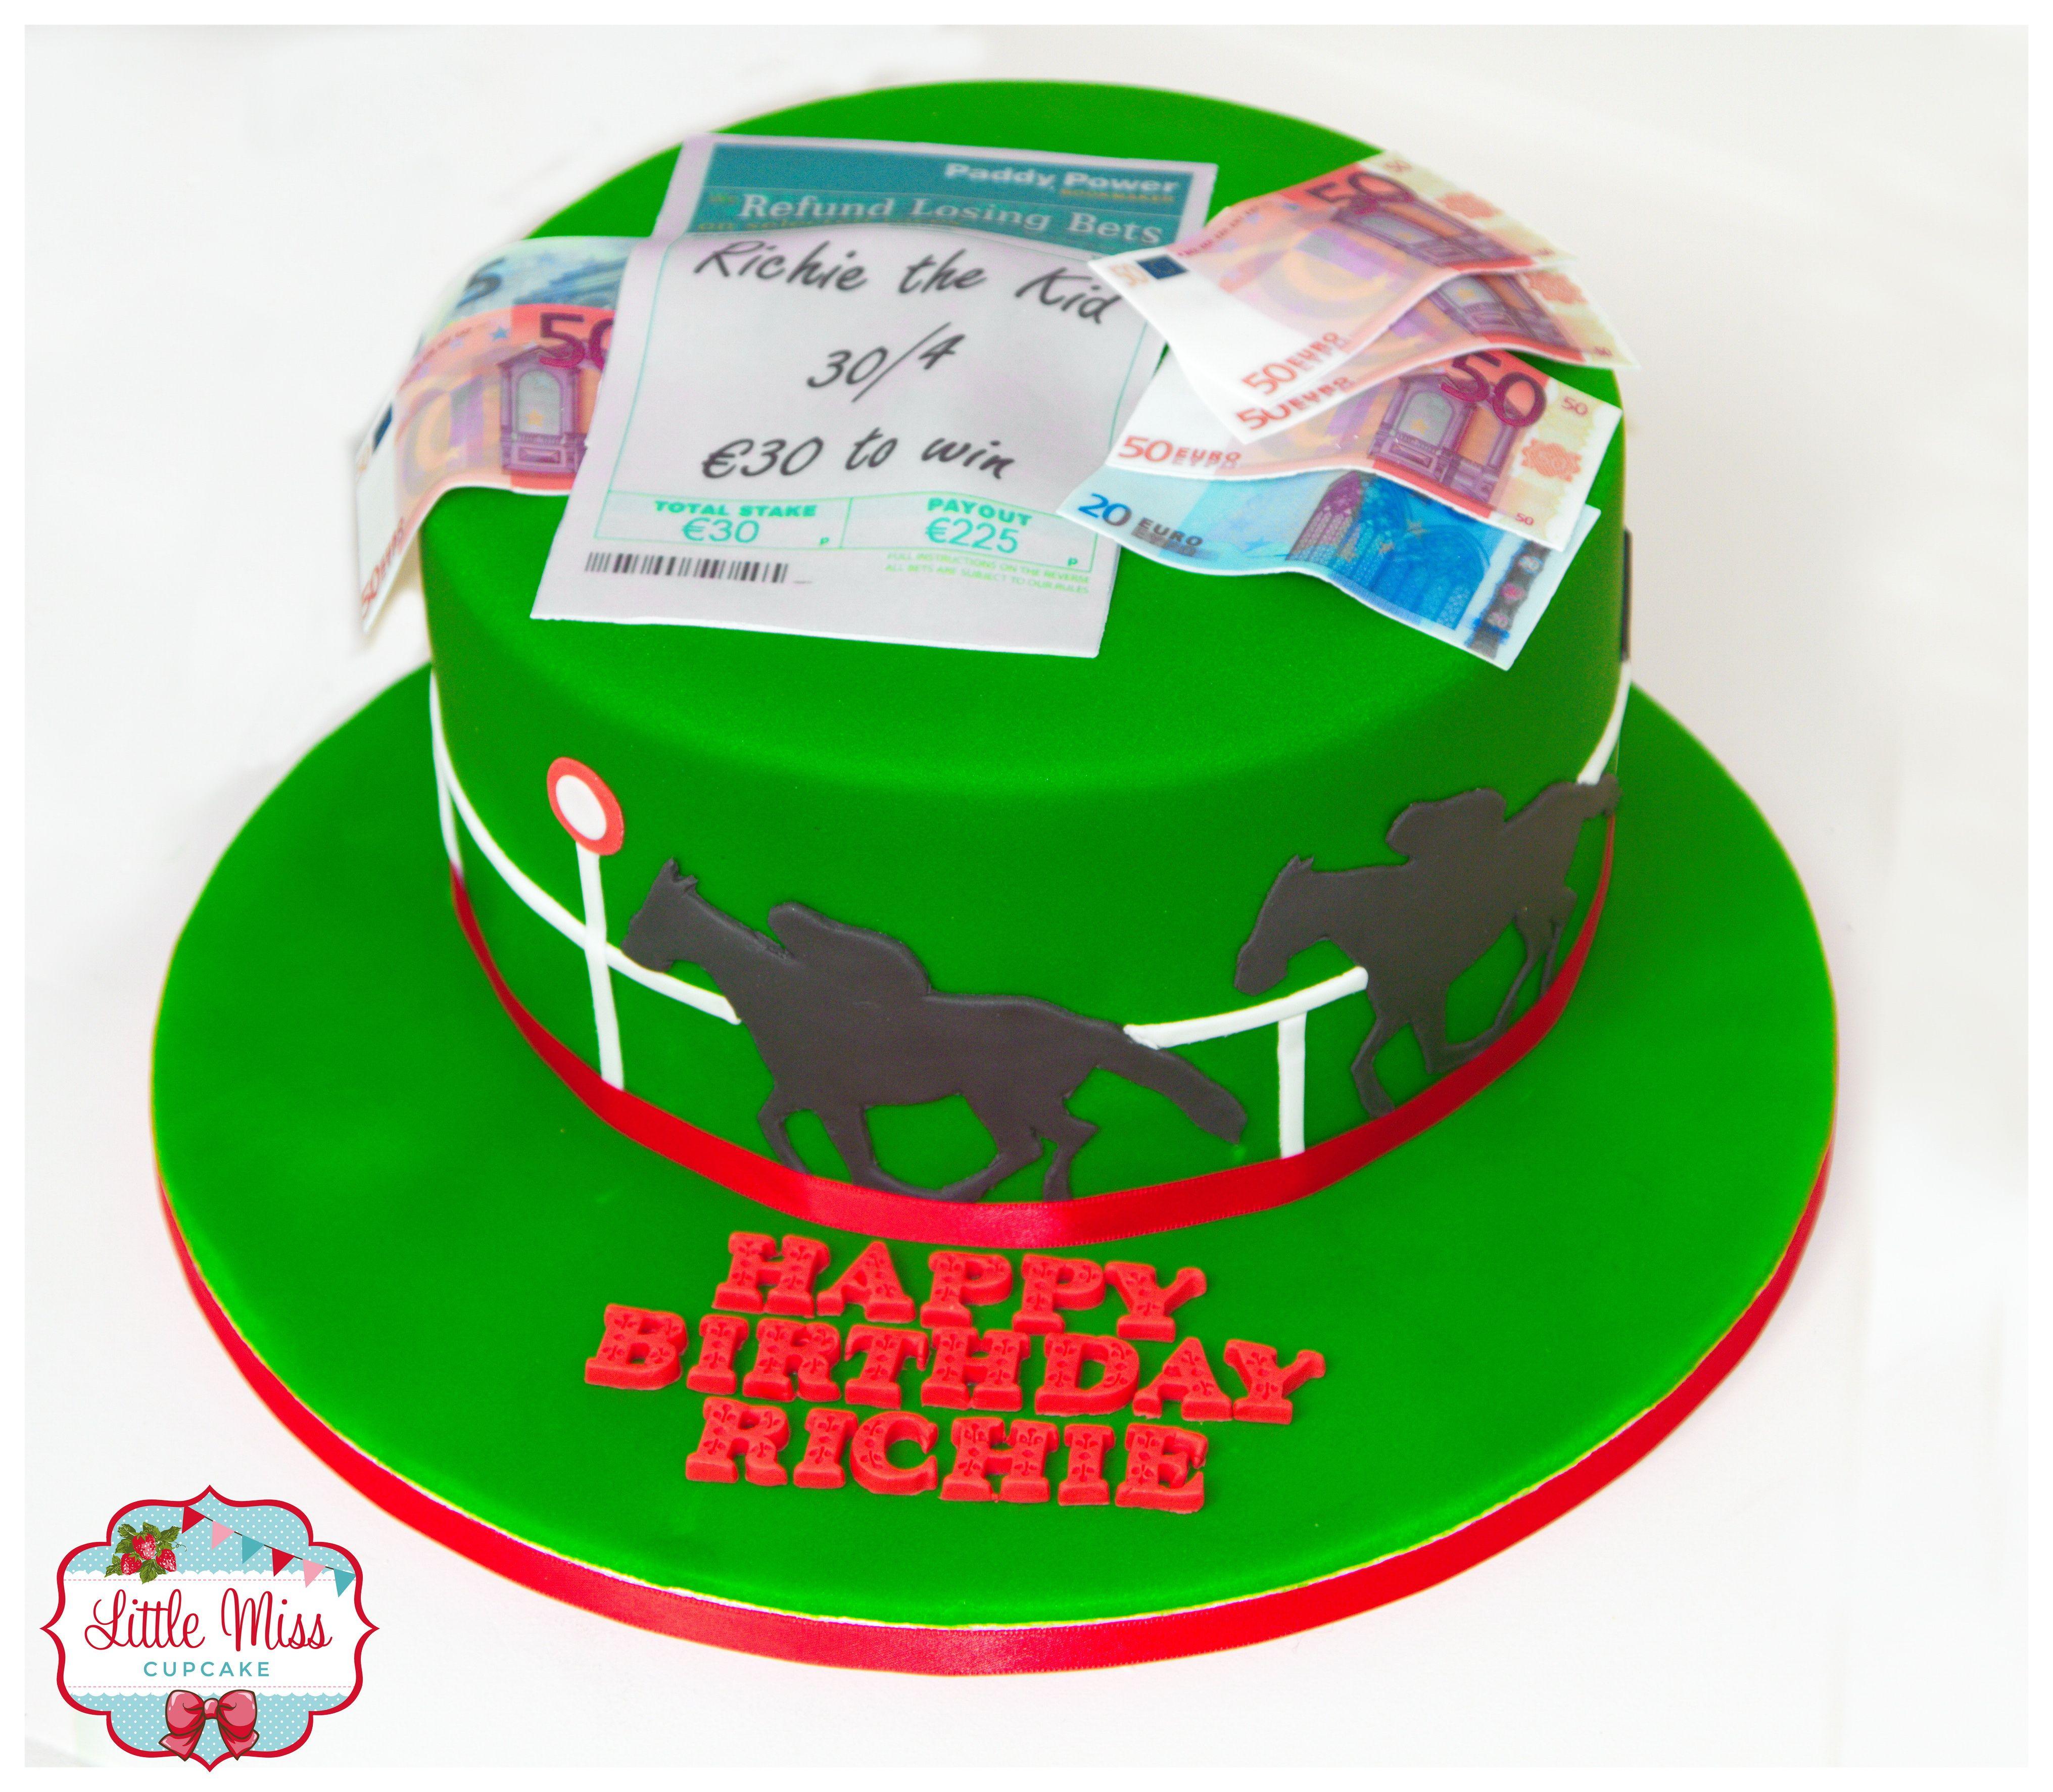 Novelty paddy power themed cake horse racing cake edible money edible bet slip